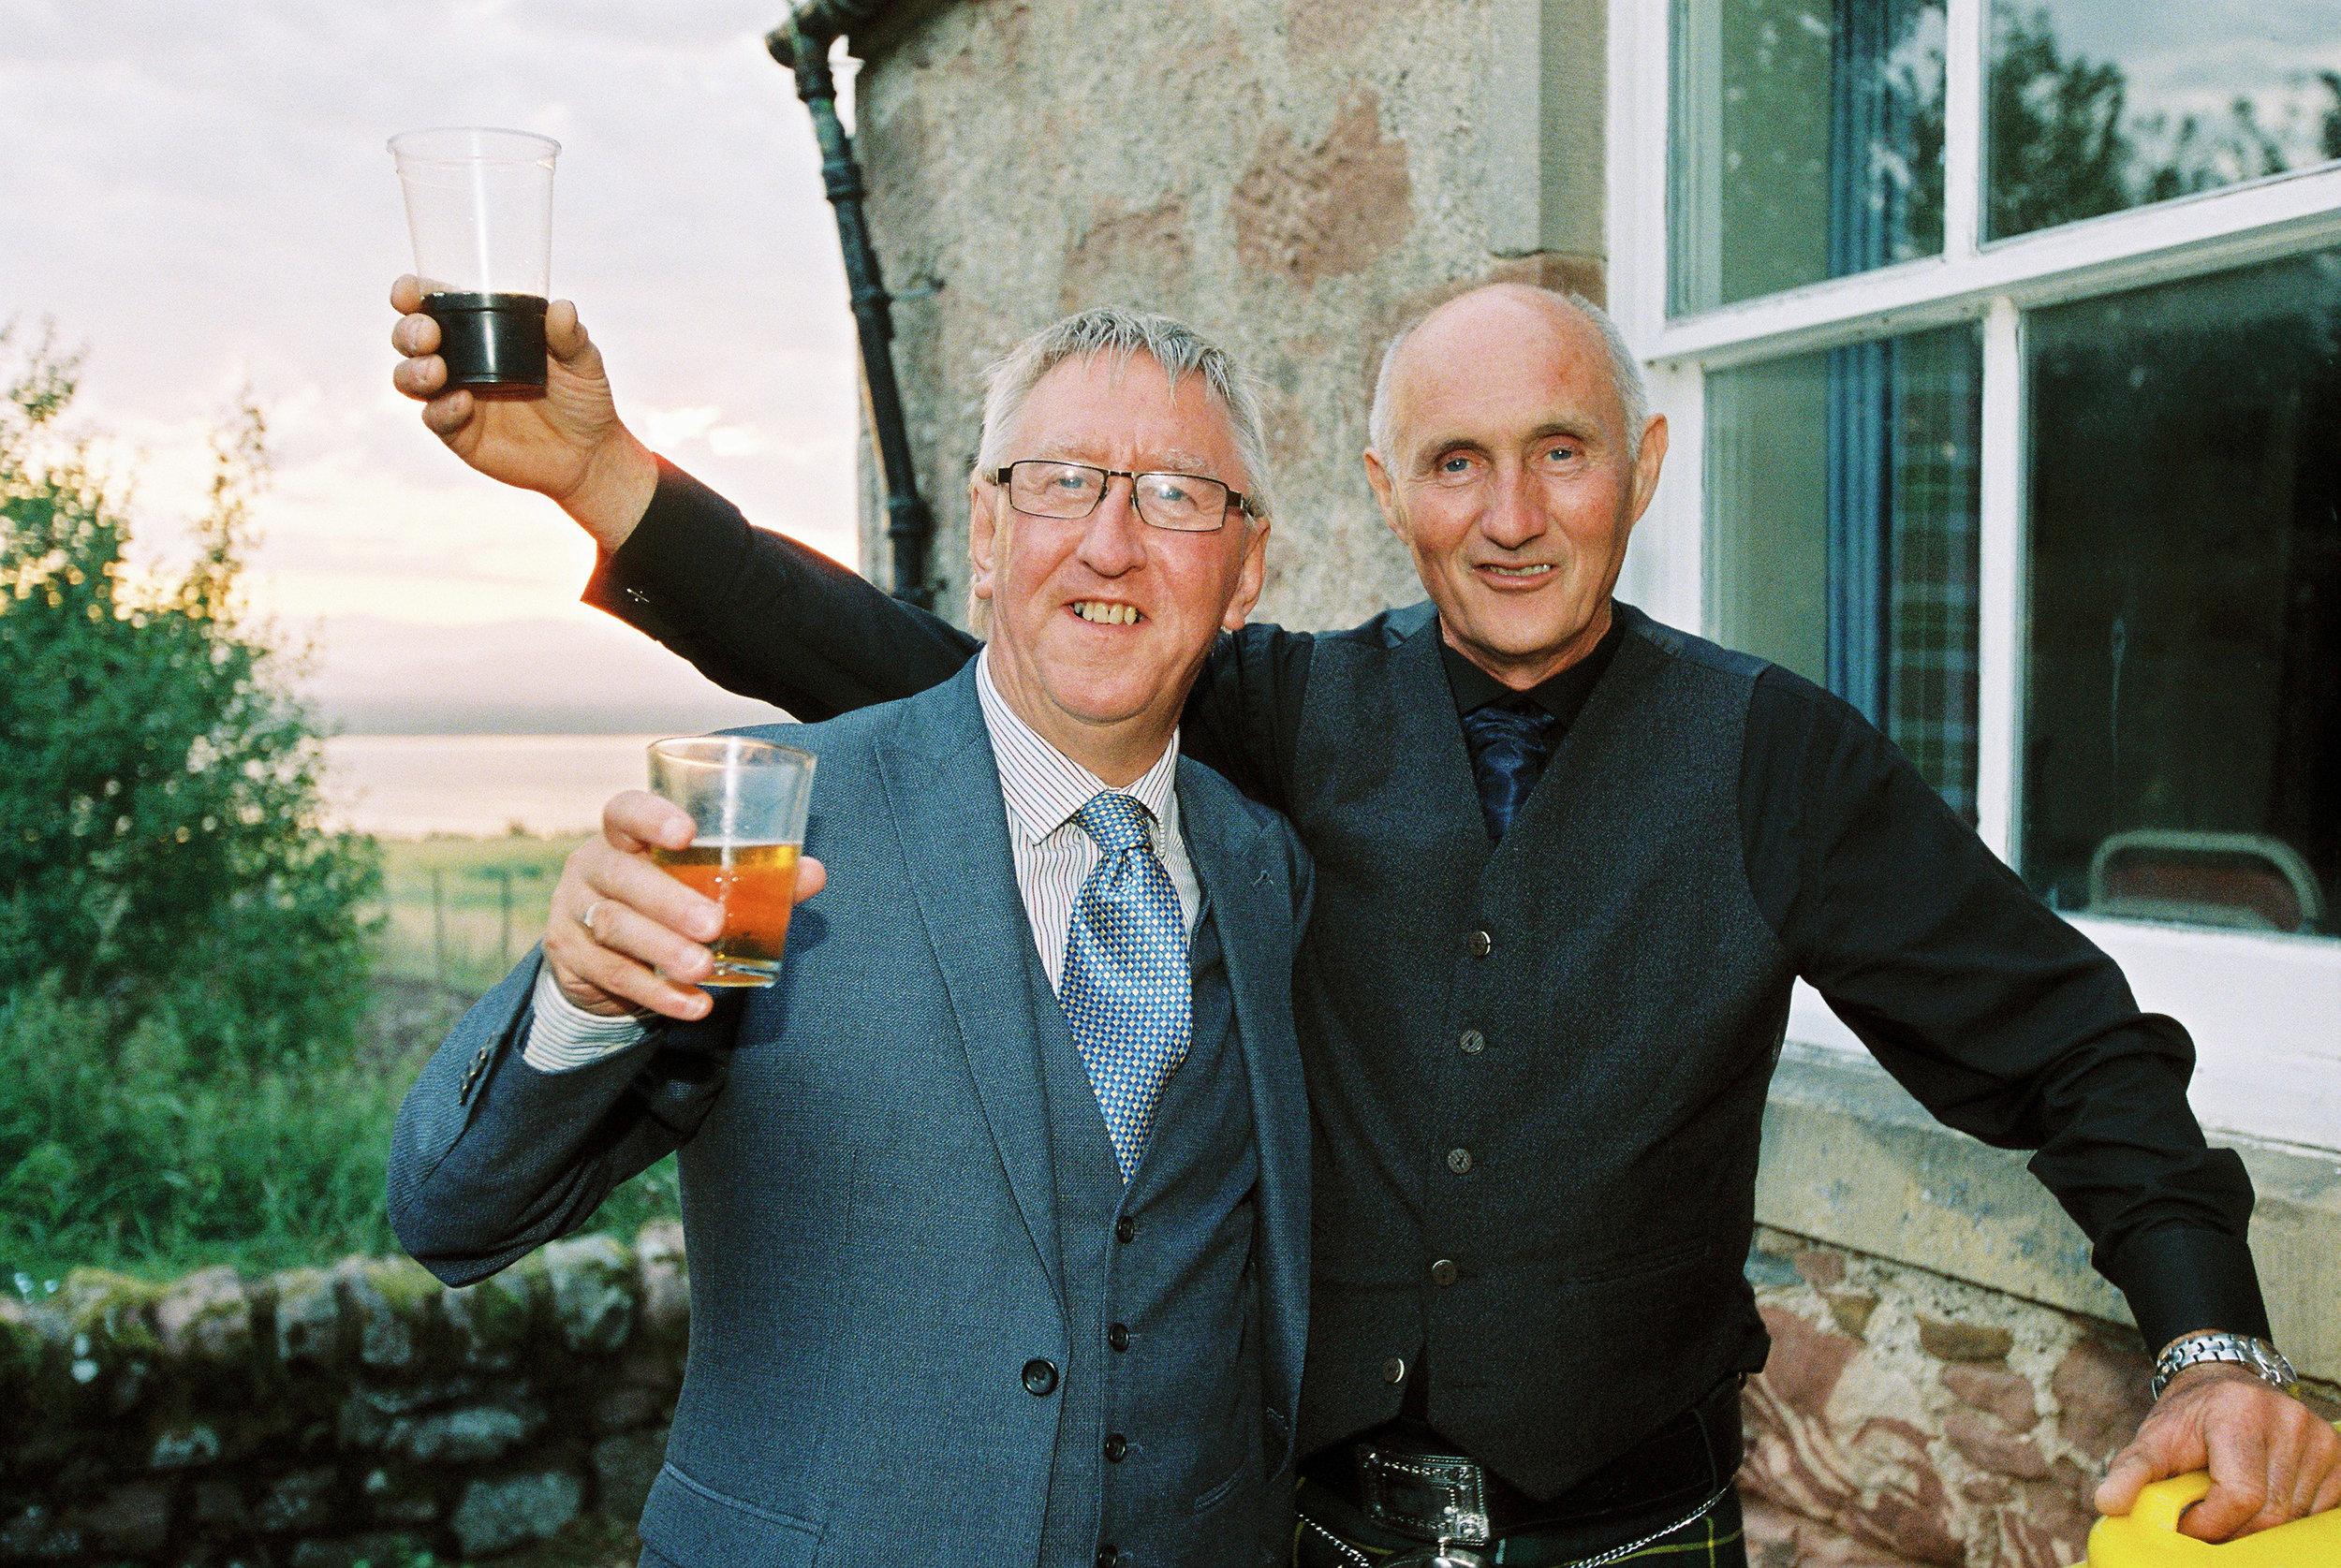 wedding-photography-scotland375.jpg